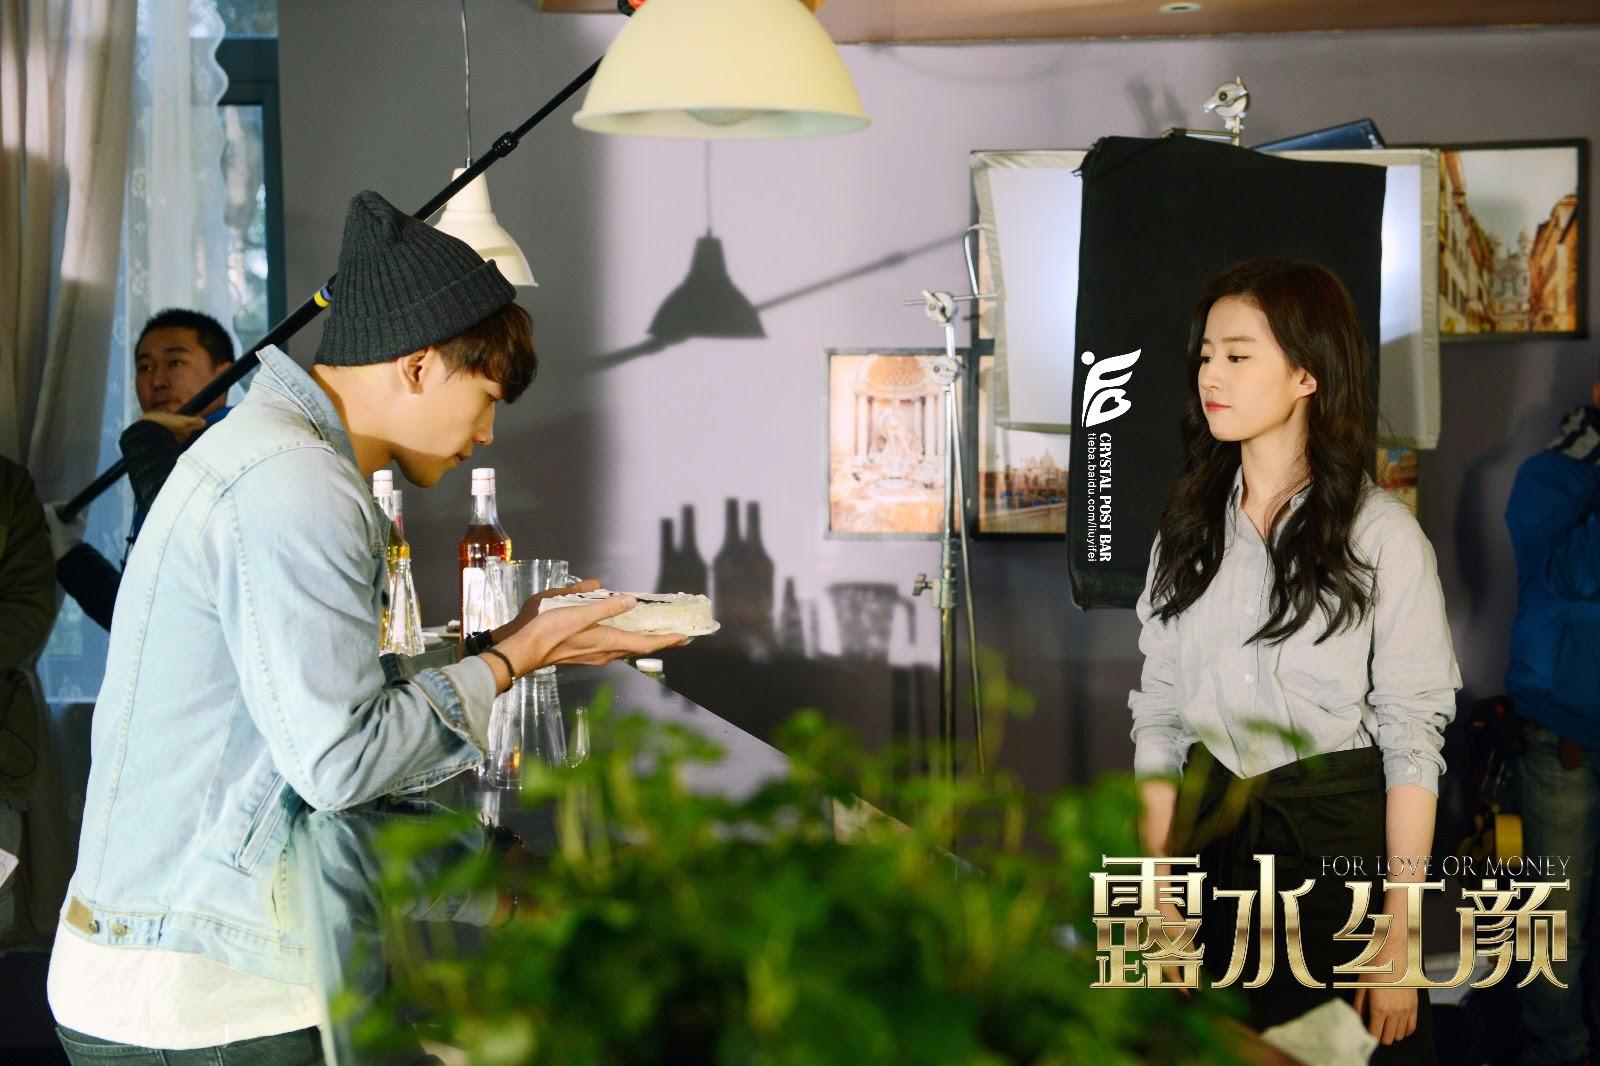 Rain 中国映画 露水紅顔_c0047605_884445.jpg